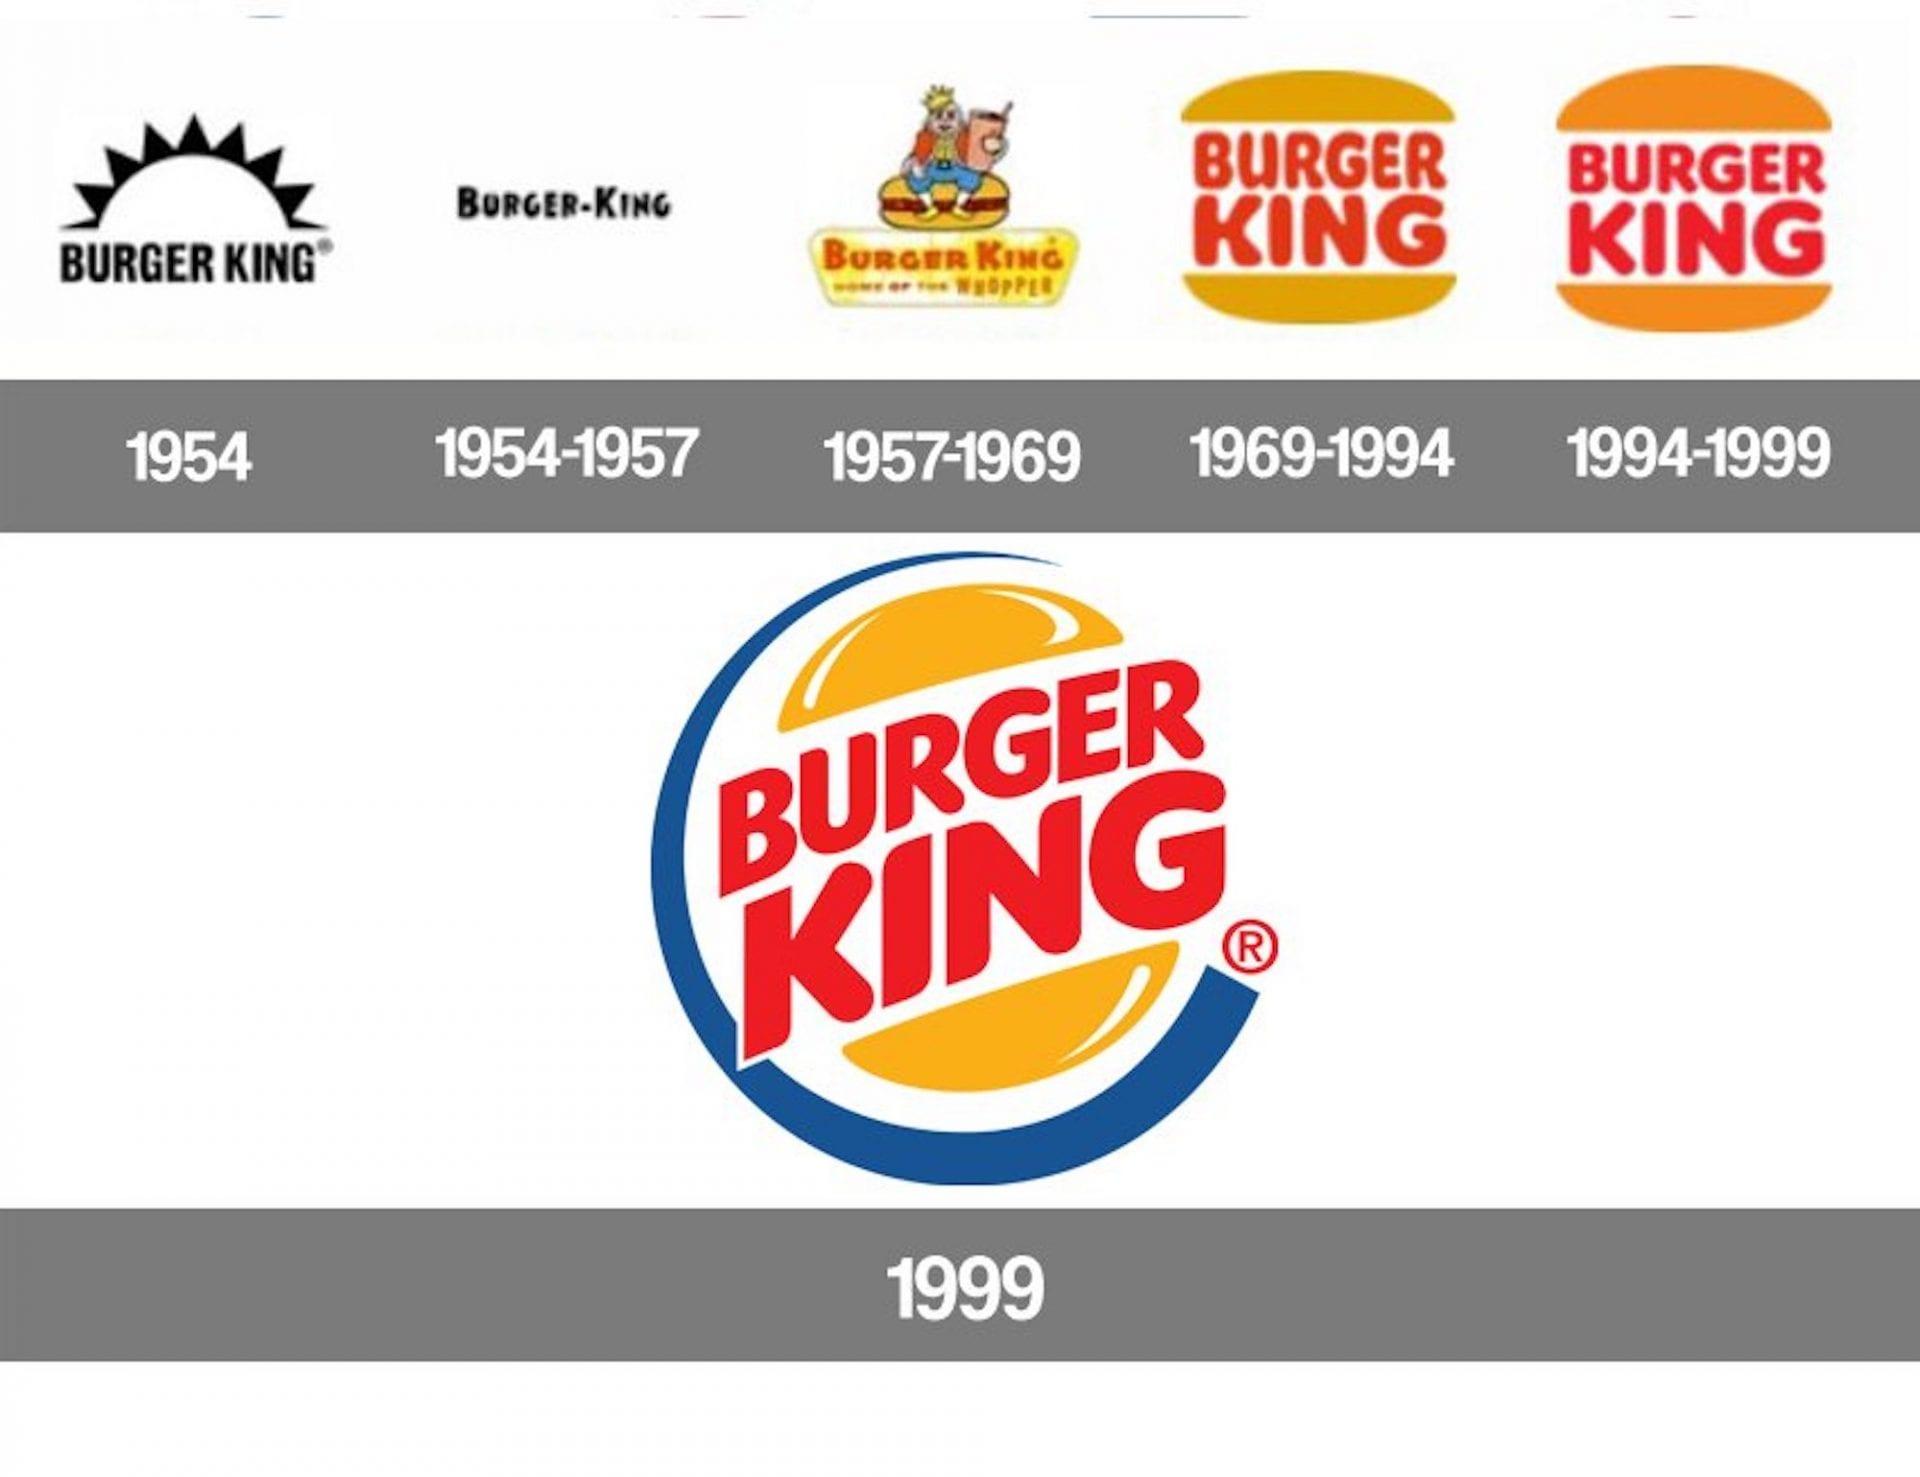 L'évolution du logo de Burger King